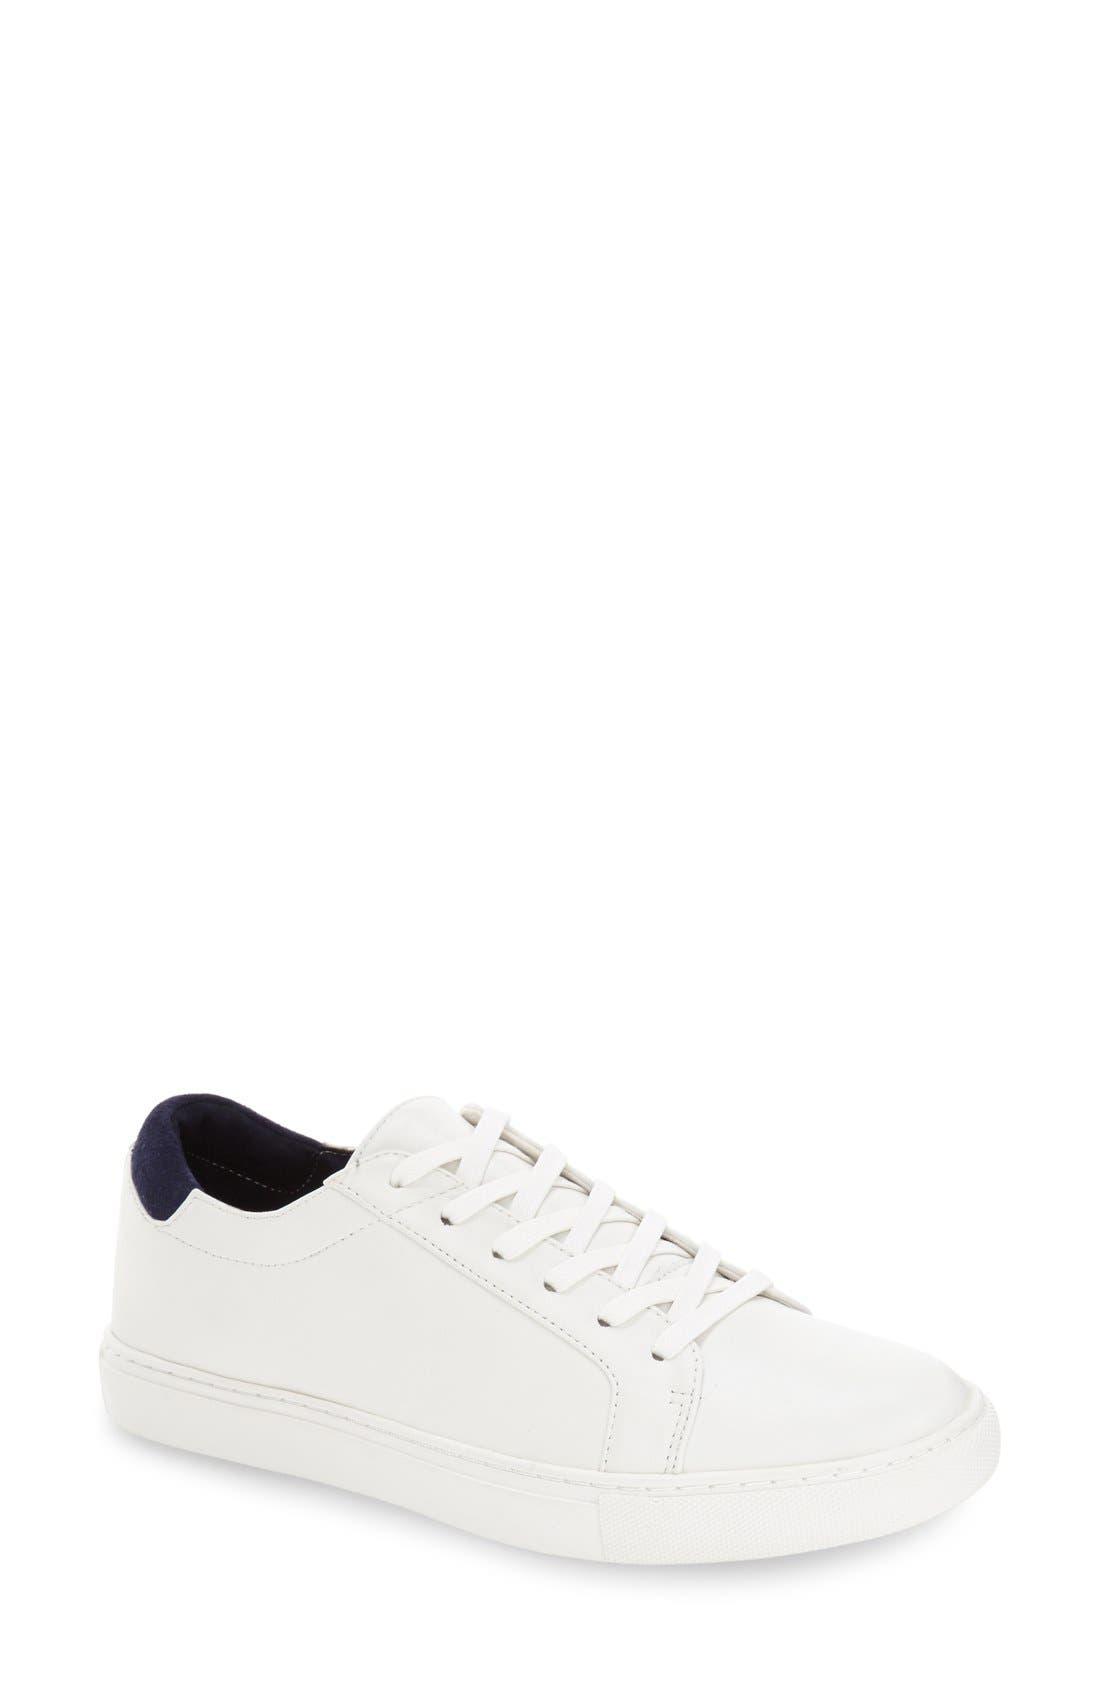 Main Image - Kenneth Cole New York 'Kam' Sneaker (Women)